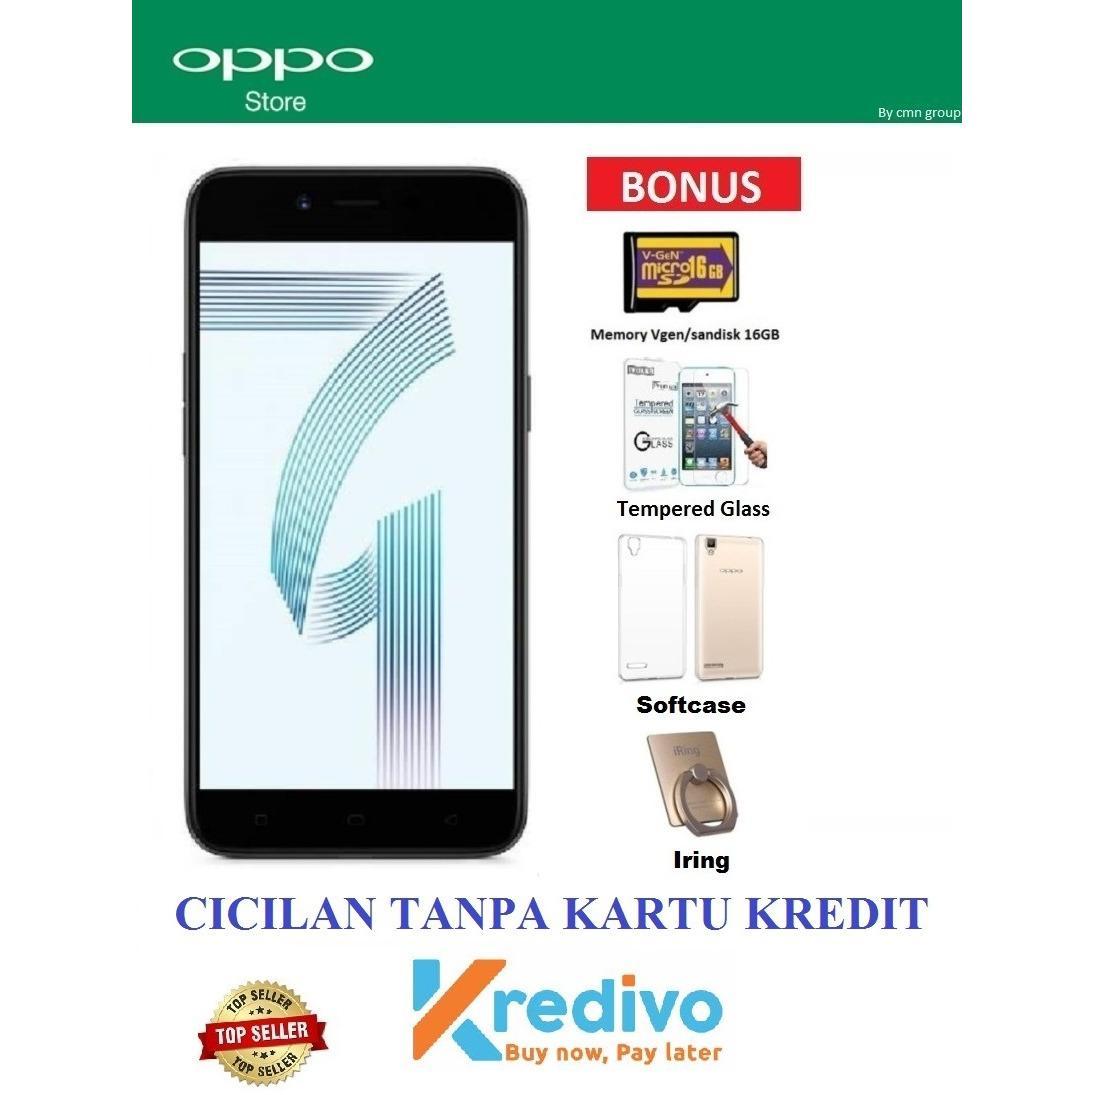 Oppo A71 Ram 3/32GB - Cicilan Tanpa Kartu Kredit - Bonus 4 Items